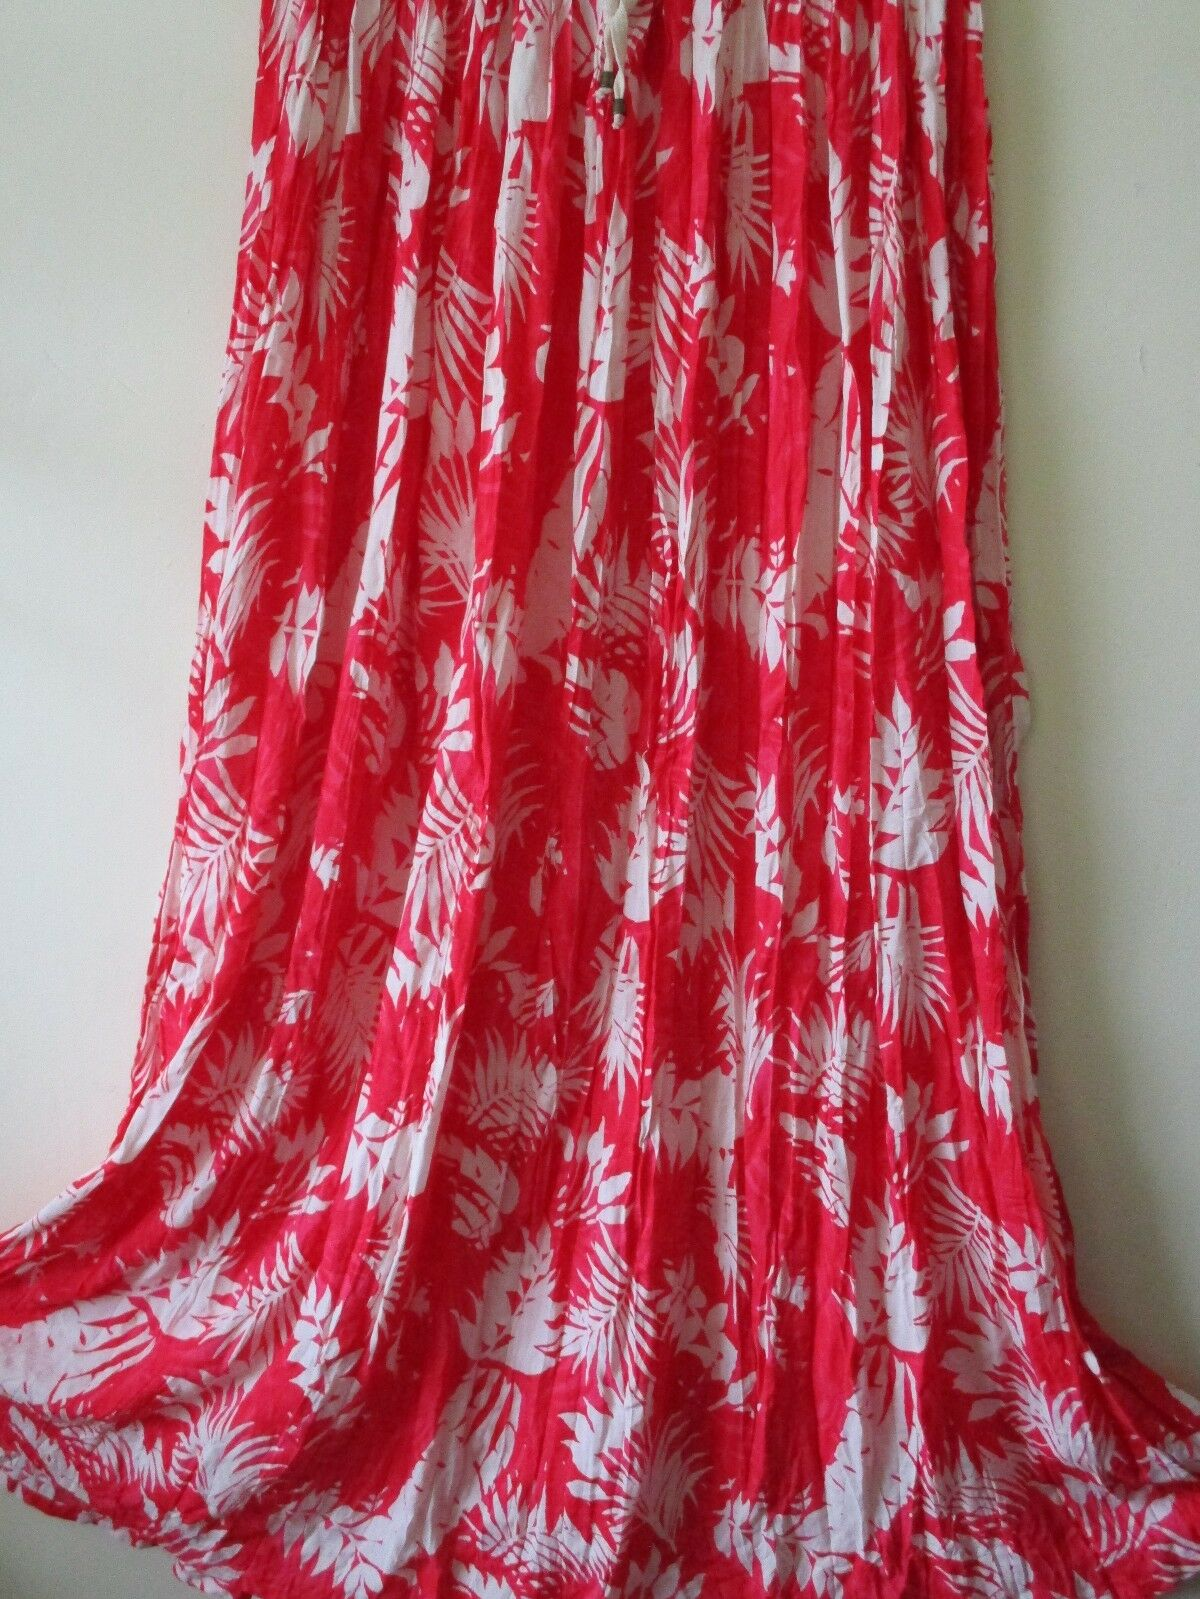 MNG MANGO SKIRT MAXI Midi Red Ivory  FESTIVAL Boho Floral Sz L  12 14 NEW